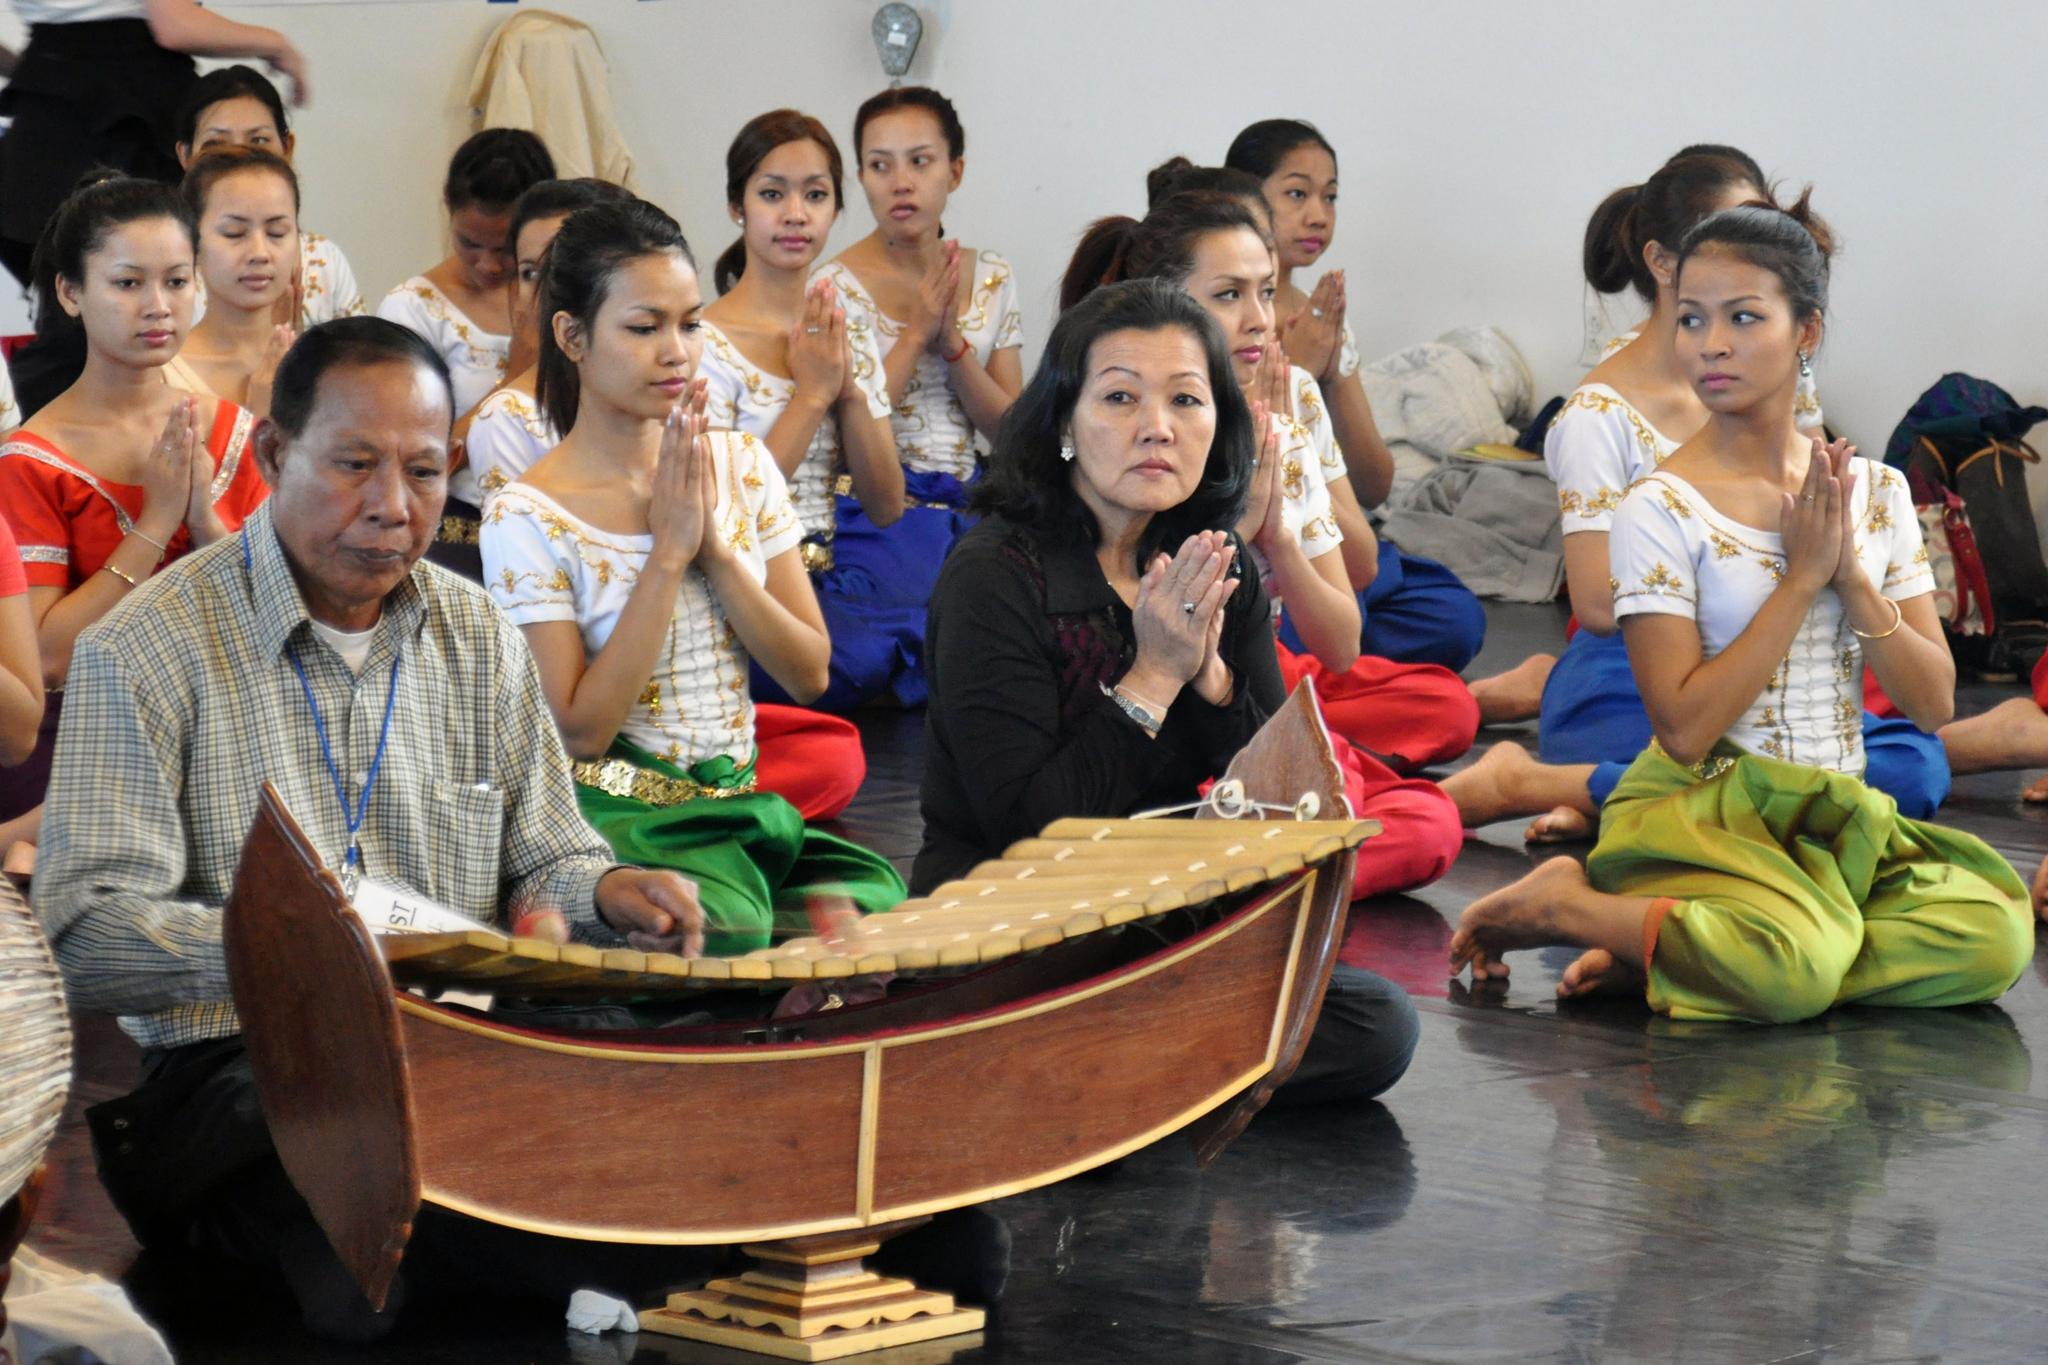 Royal Ballet of Cambodia [slide show]